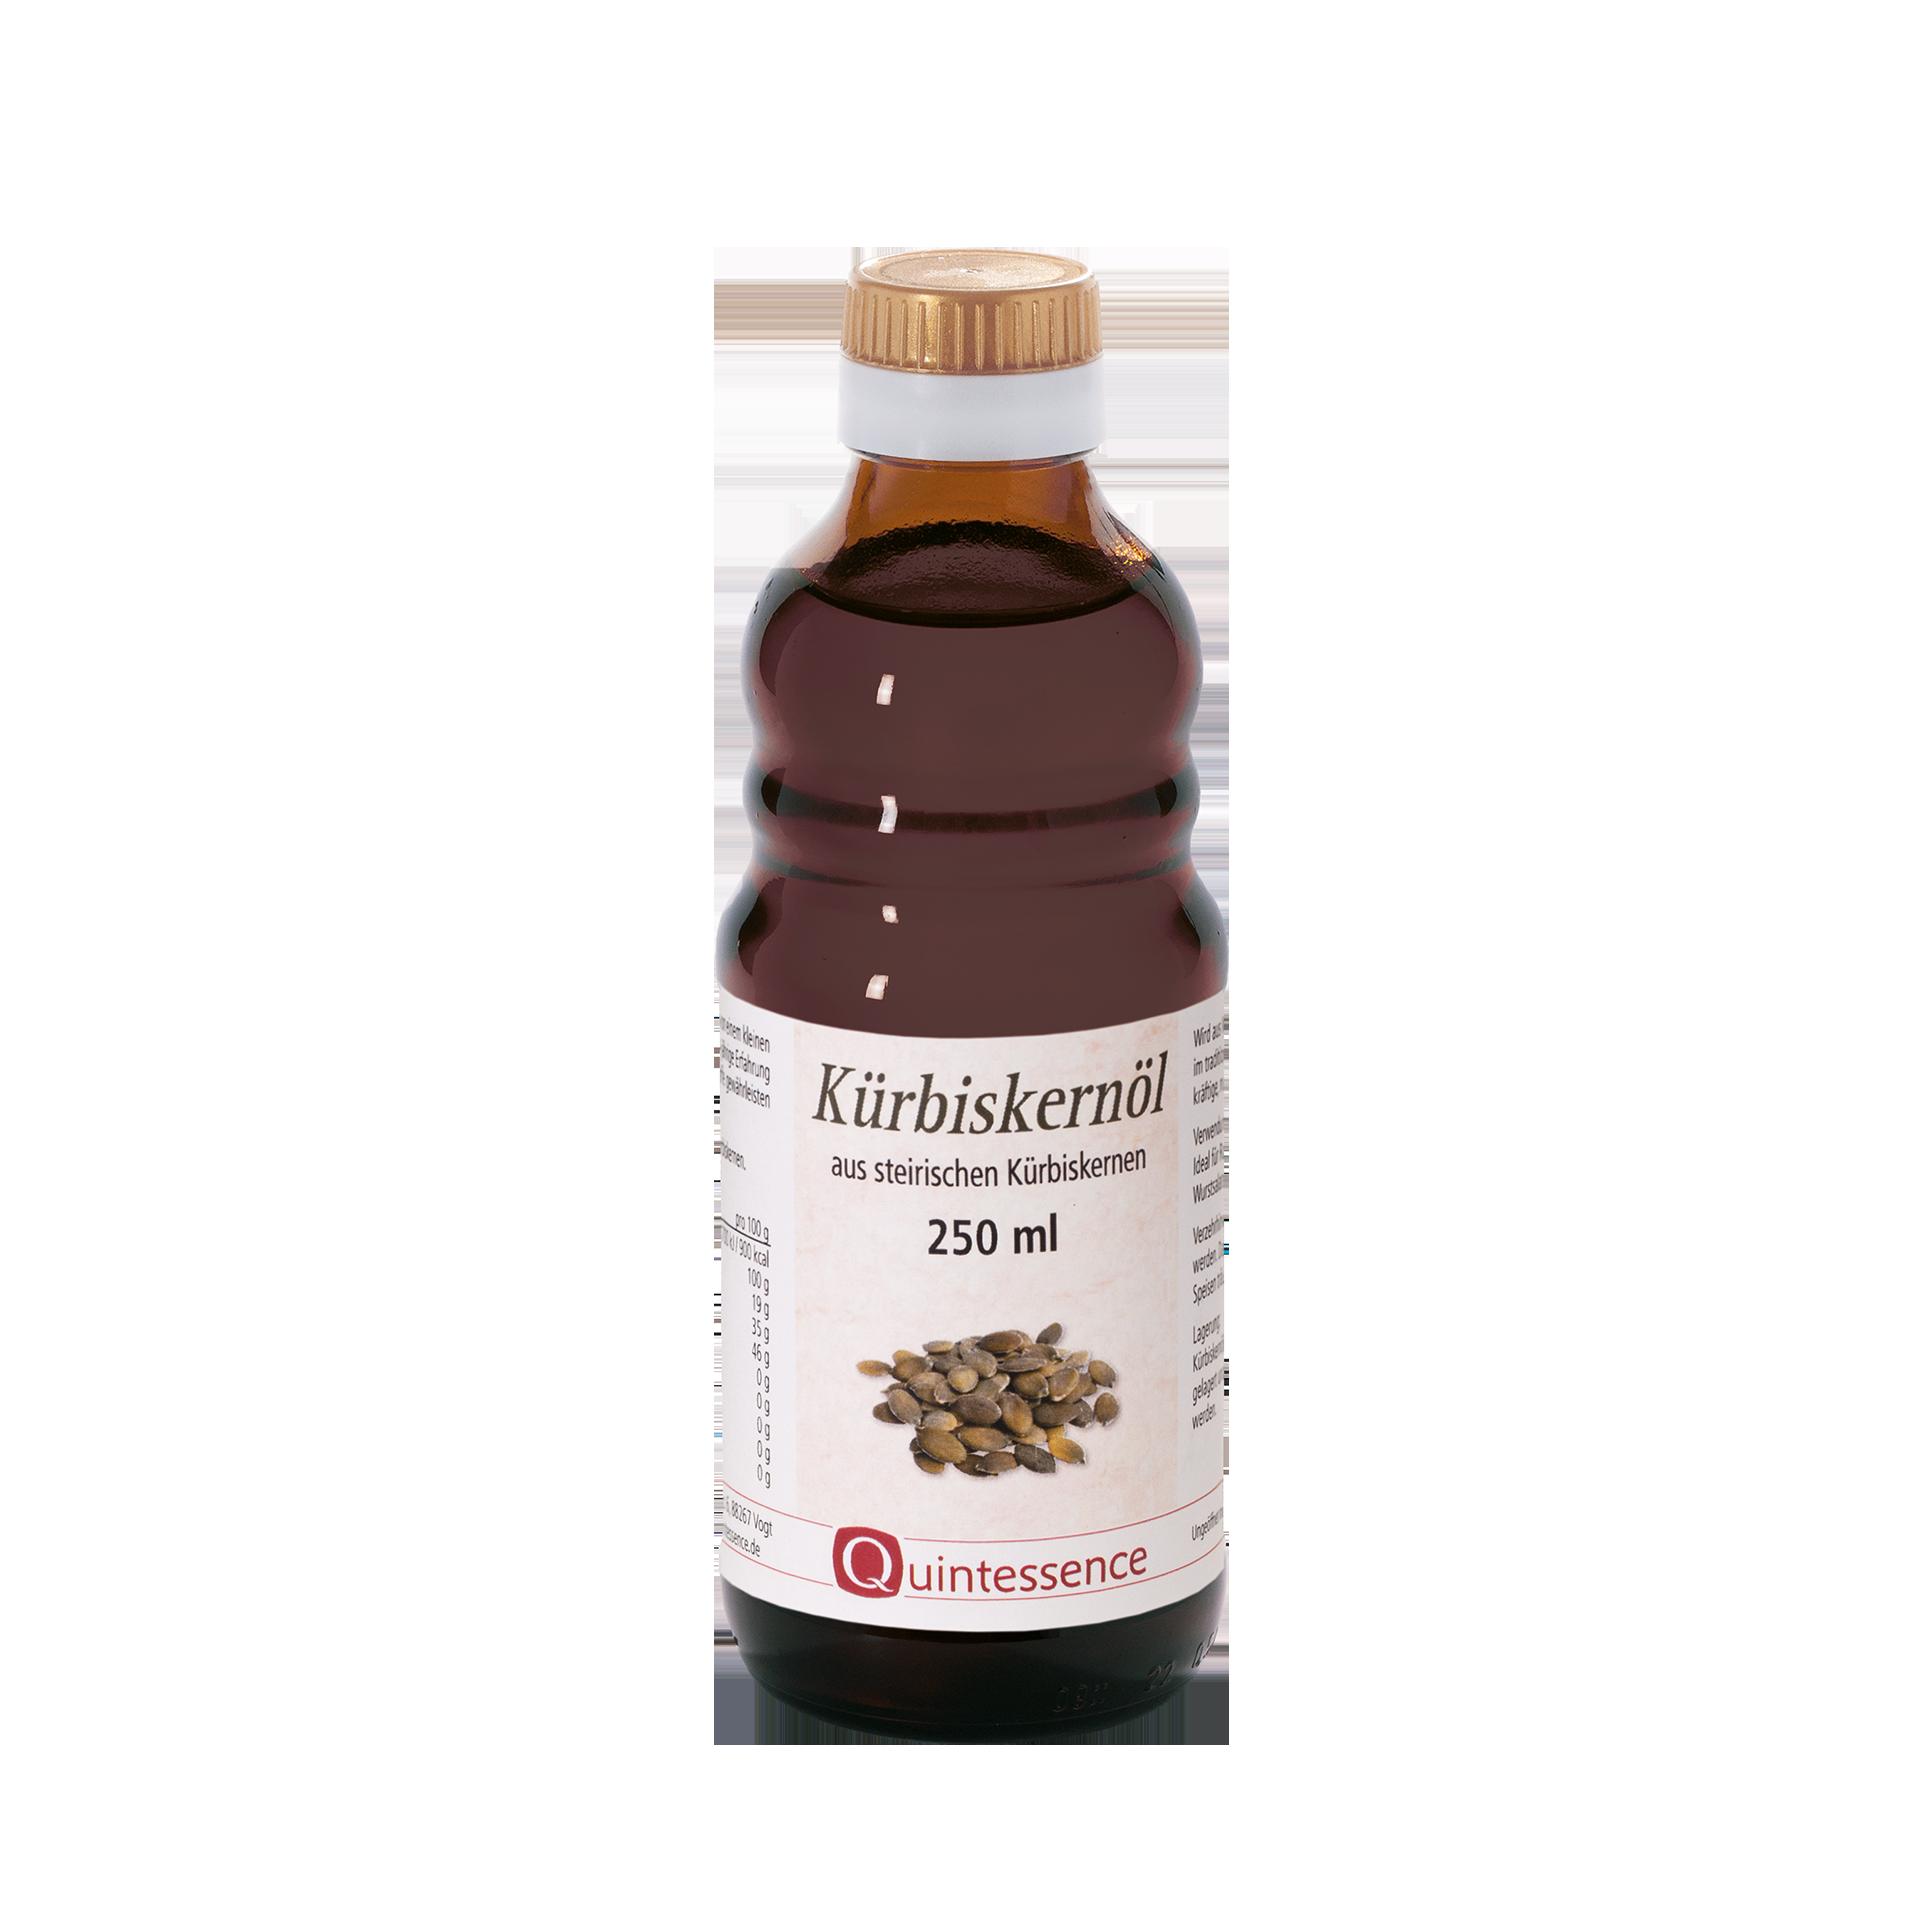 Kürbiskernöl, 250 ml